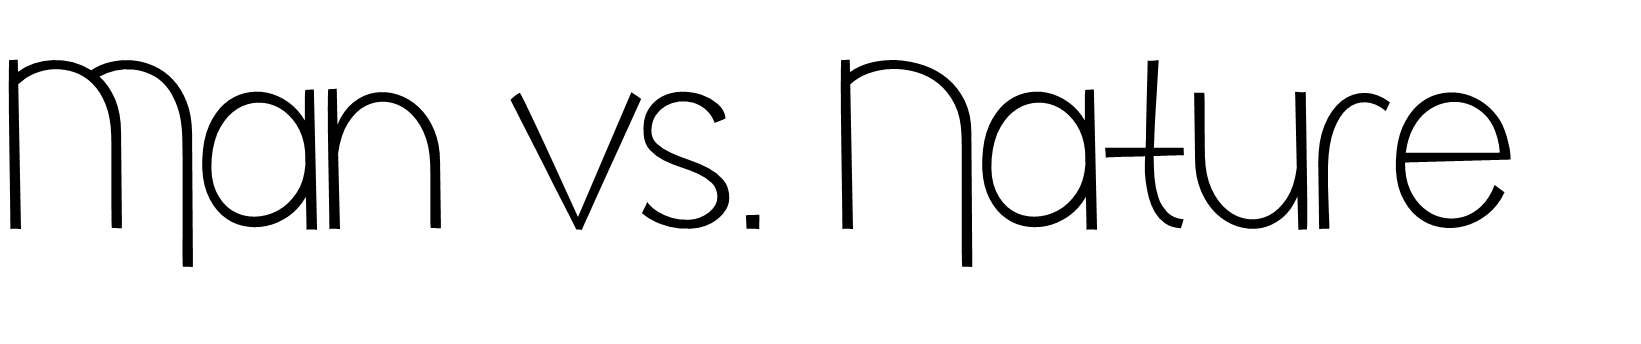 Maze clipart never ending. Presentation name on emaze